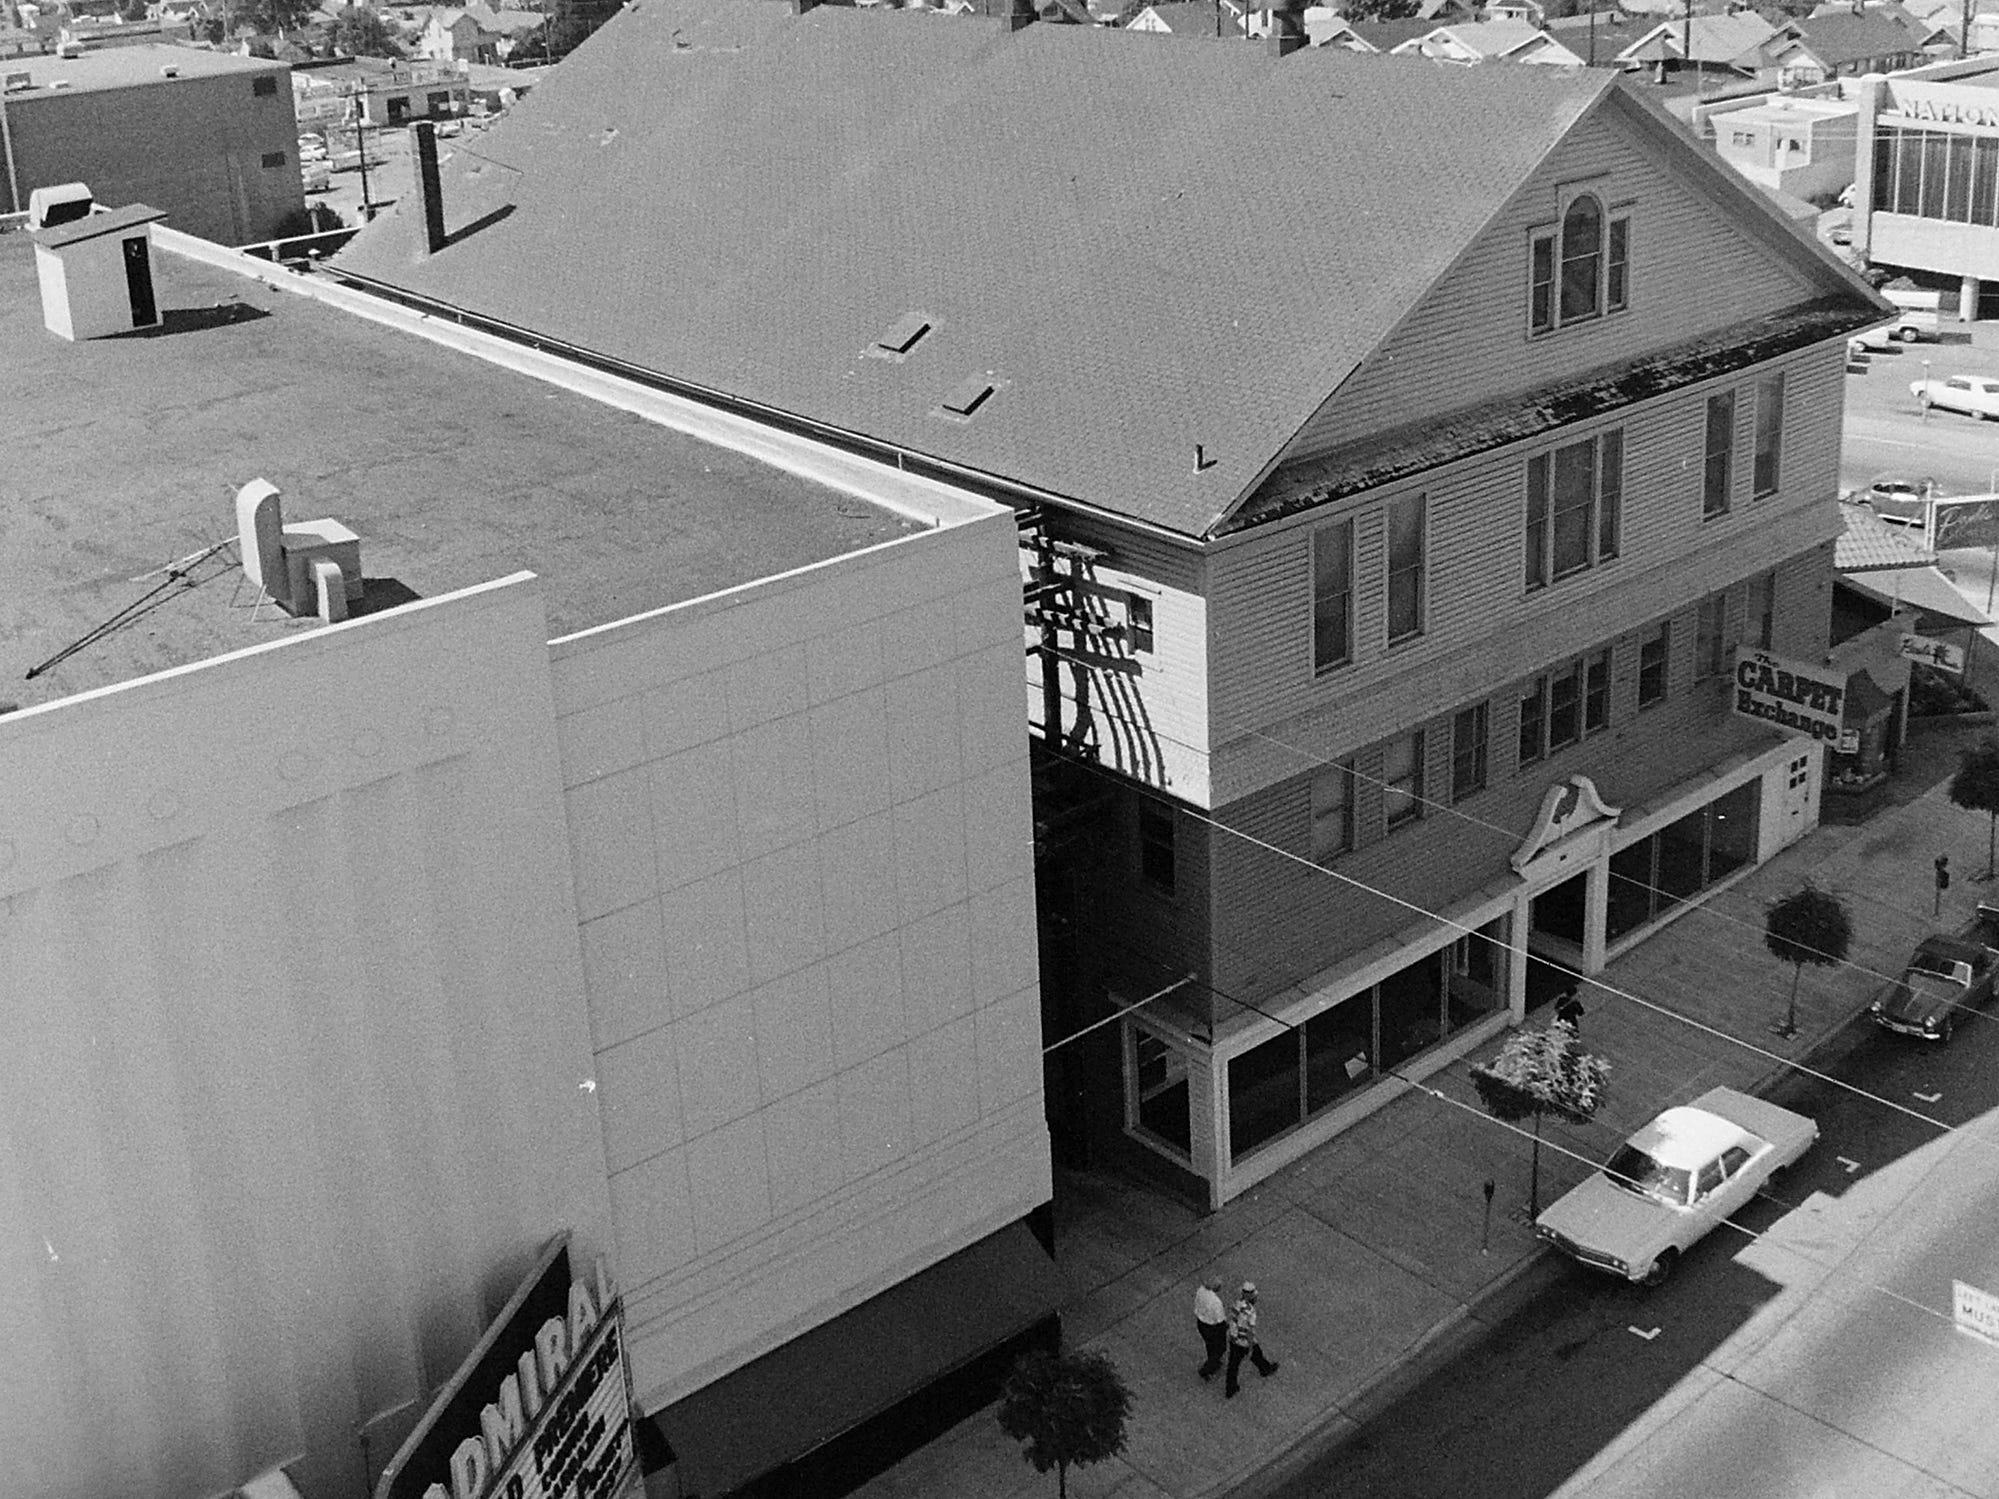 08/21/73Old Bremer Building